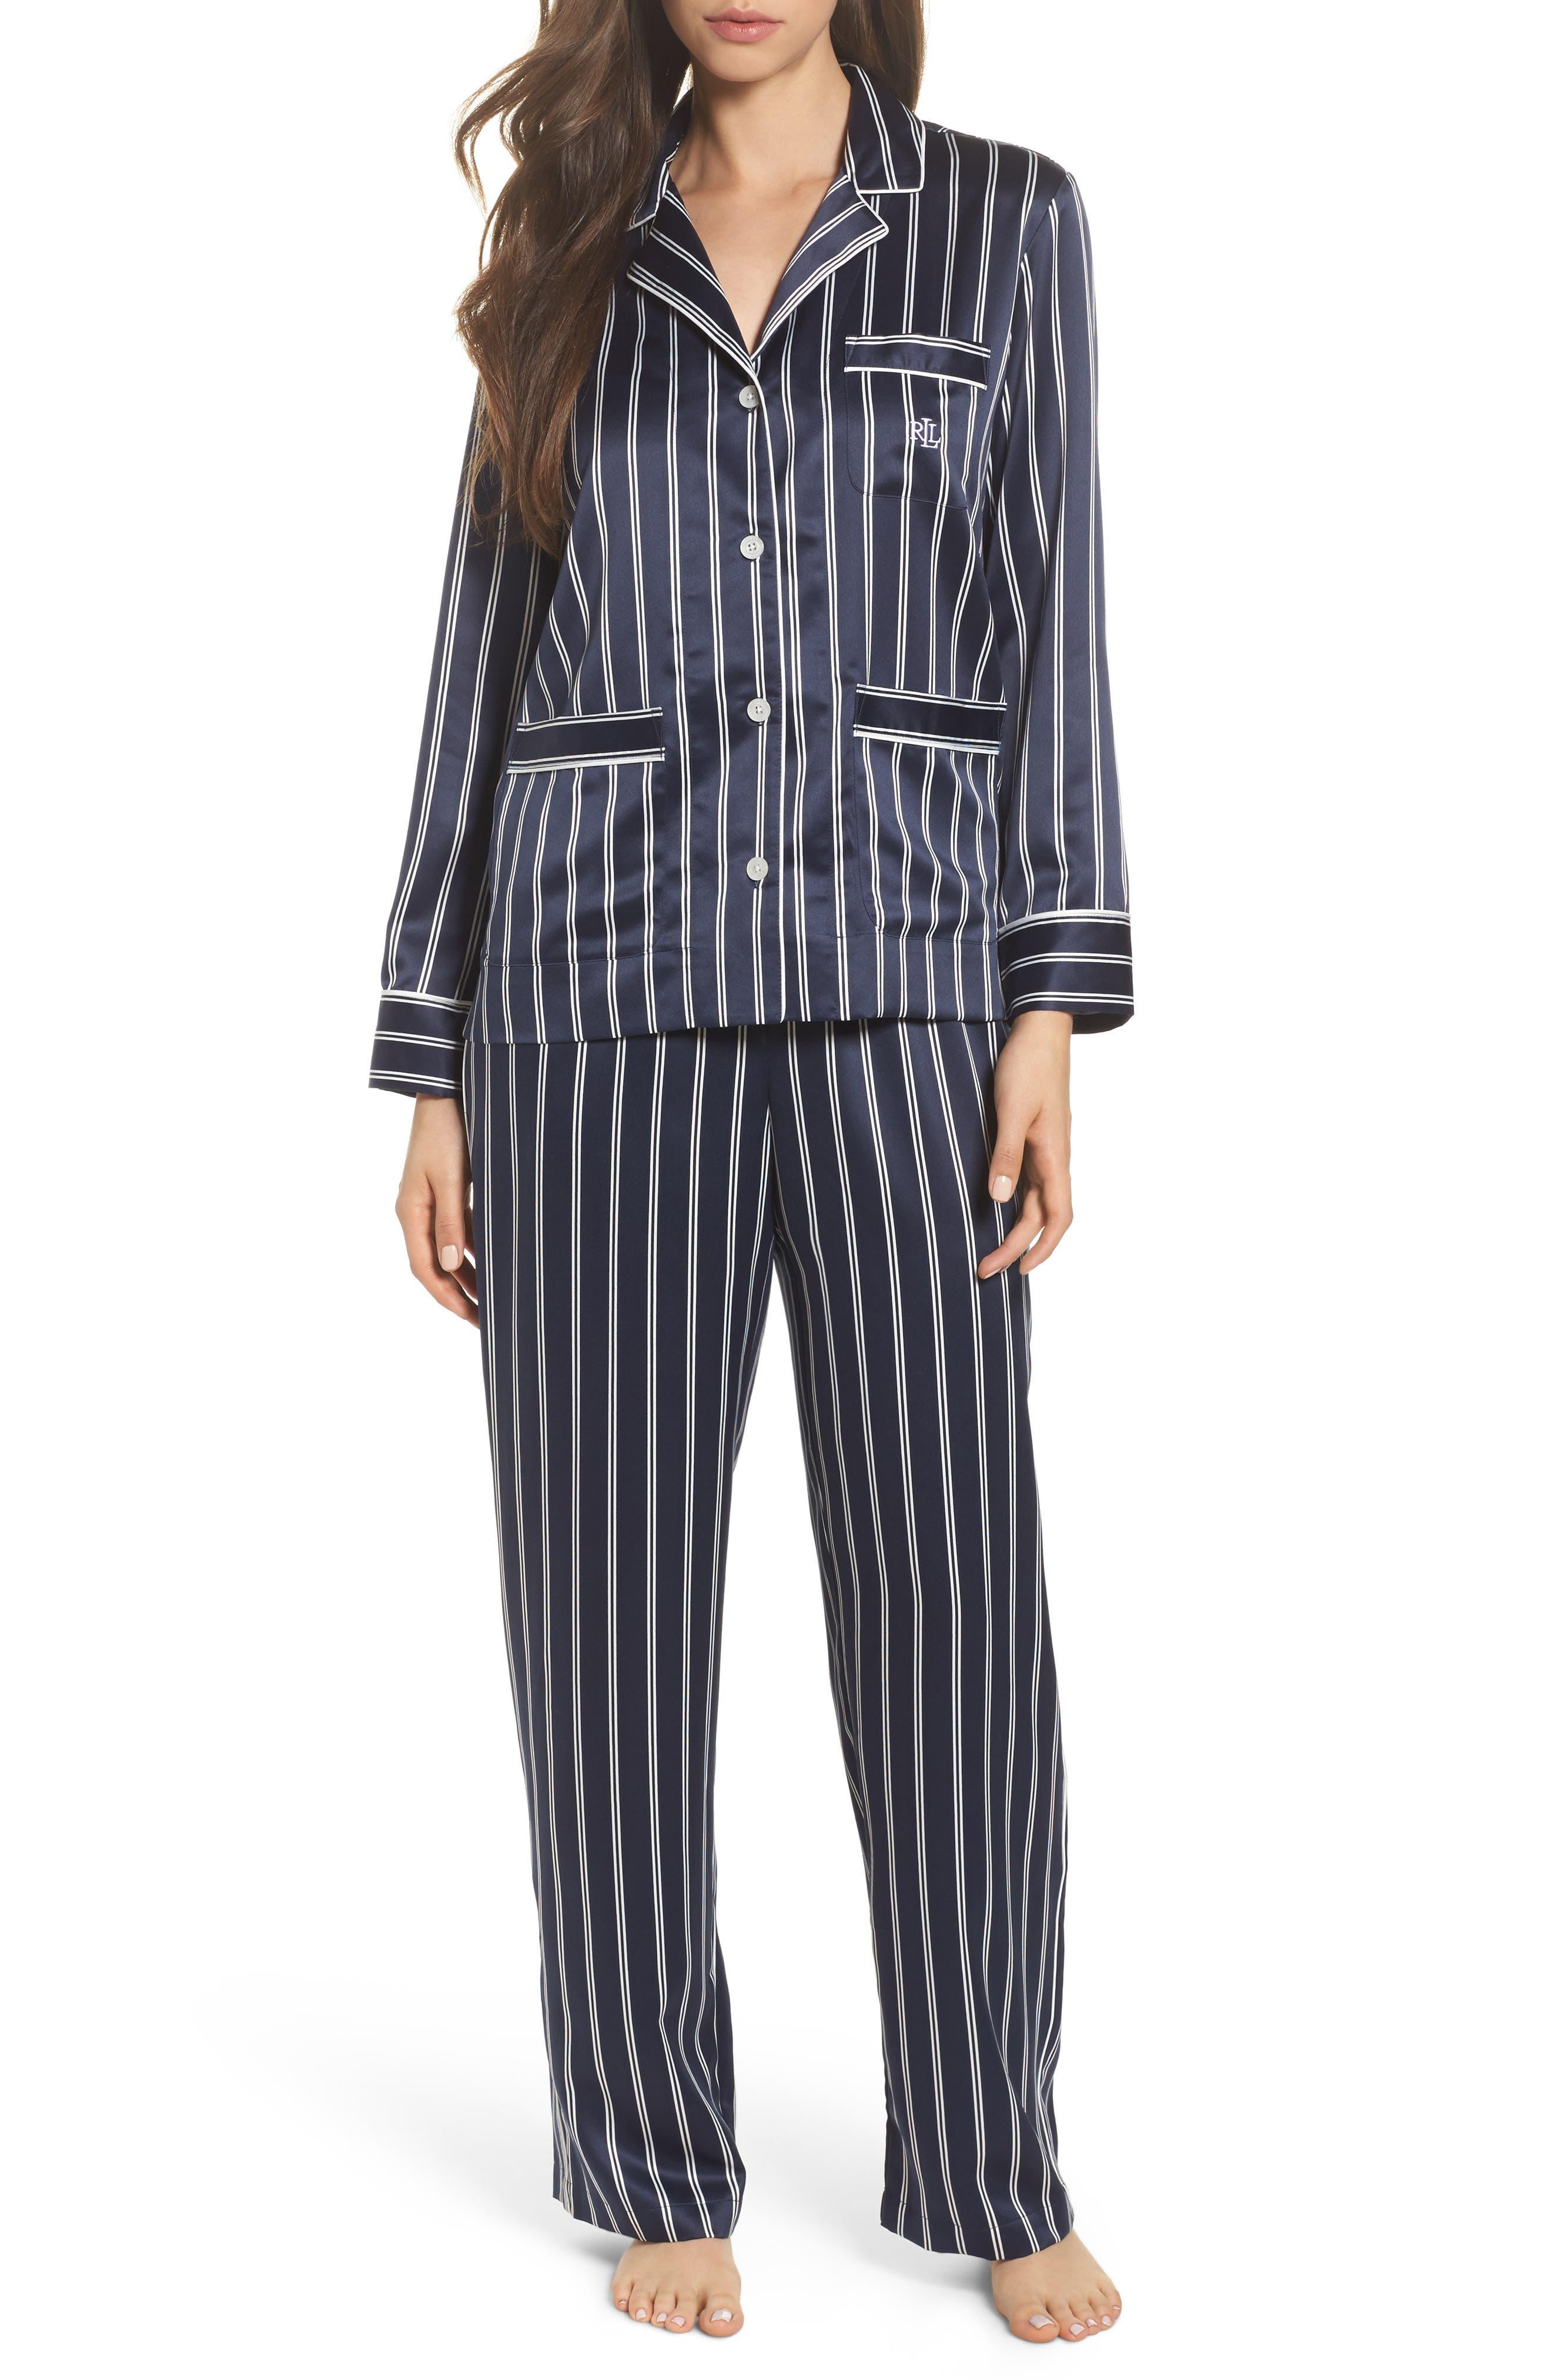 Satin Pajamas,                             Main thumbnail 1, color,                             Navy Stripe